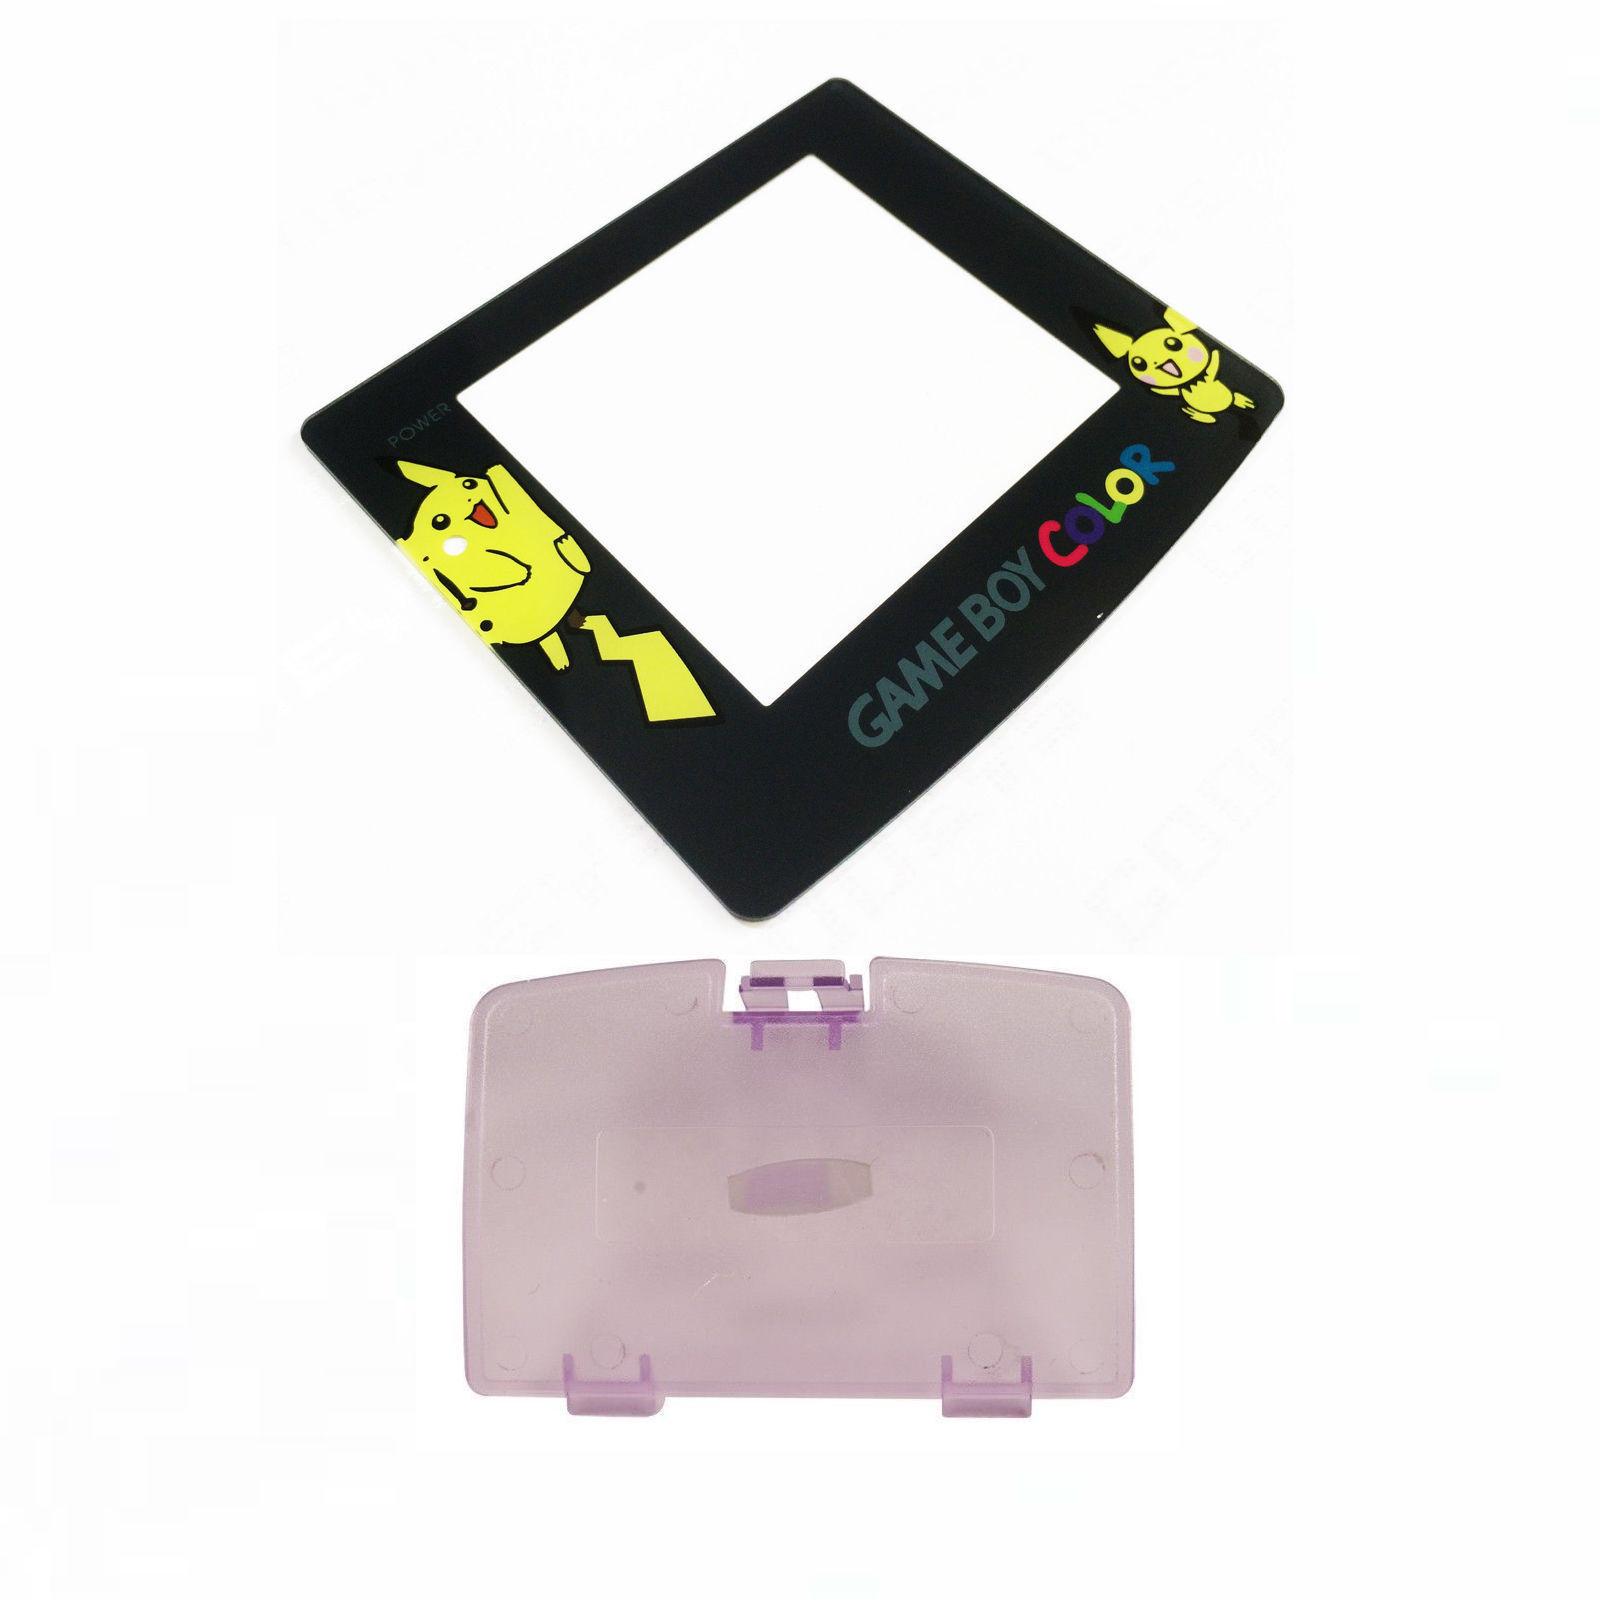 New ATOMIC PURPLE Game Boy Color Battery Cover + Pokemon Pikachu Screen GBC